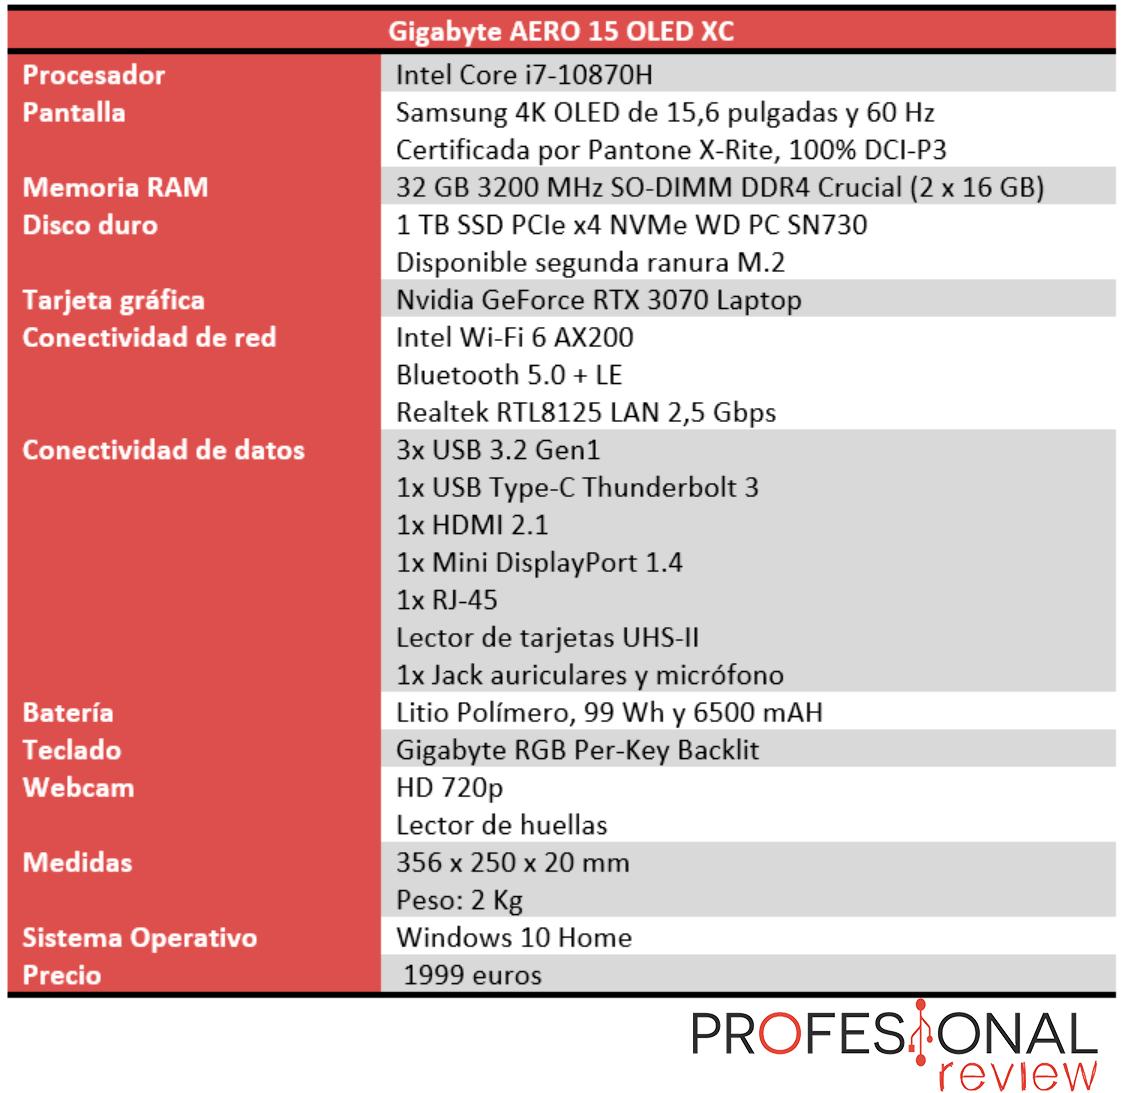 Gigabyte AERO 15 OLED XC Características